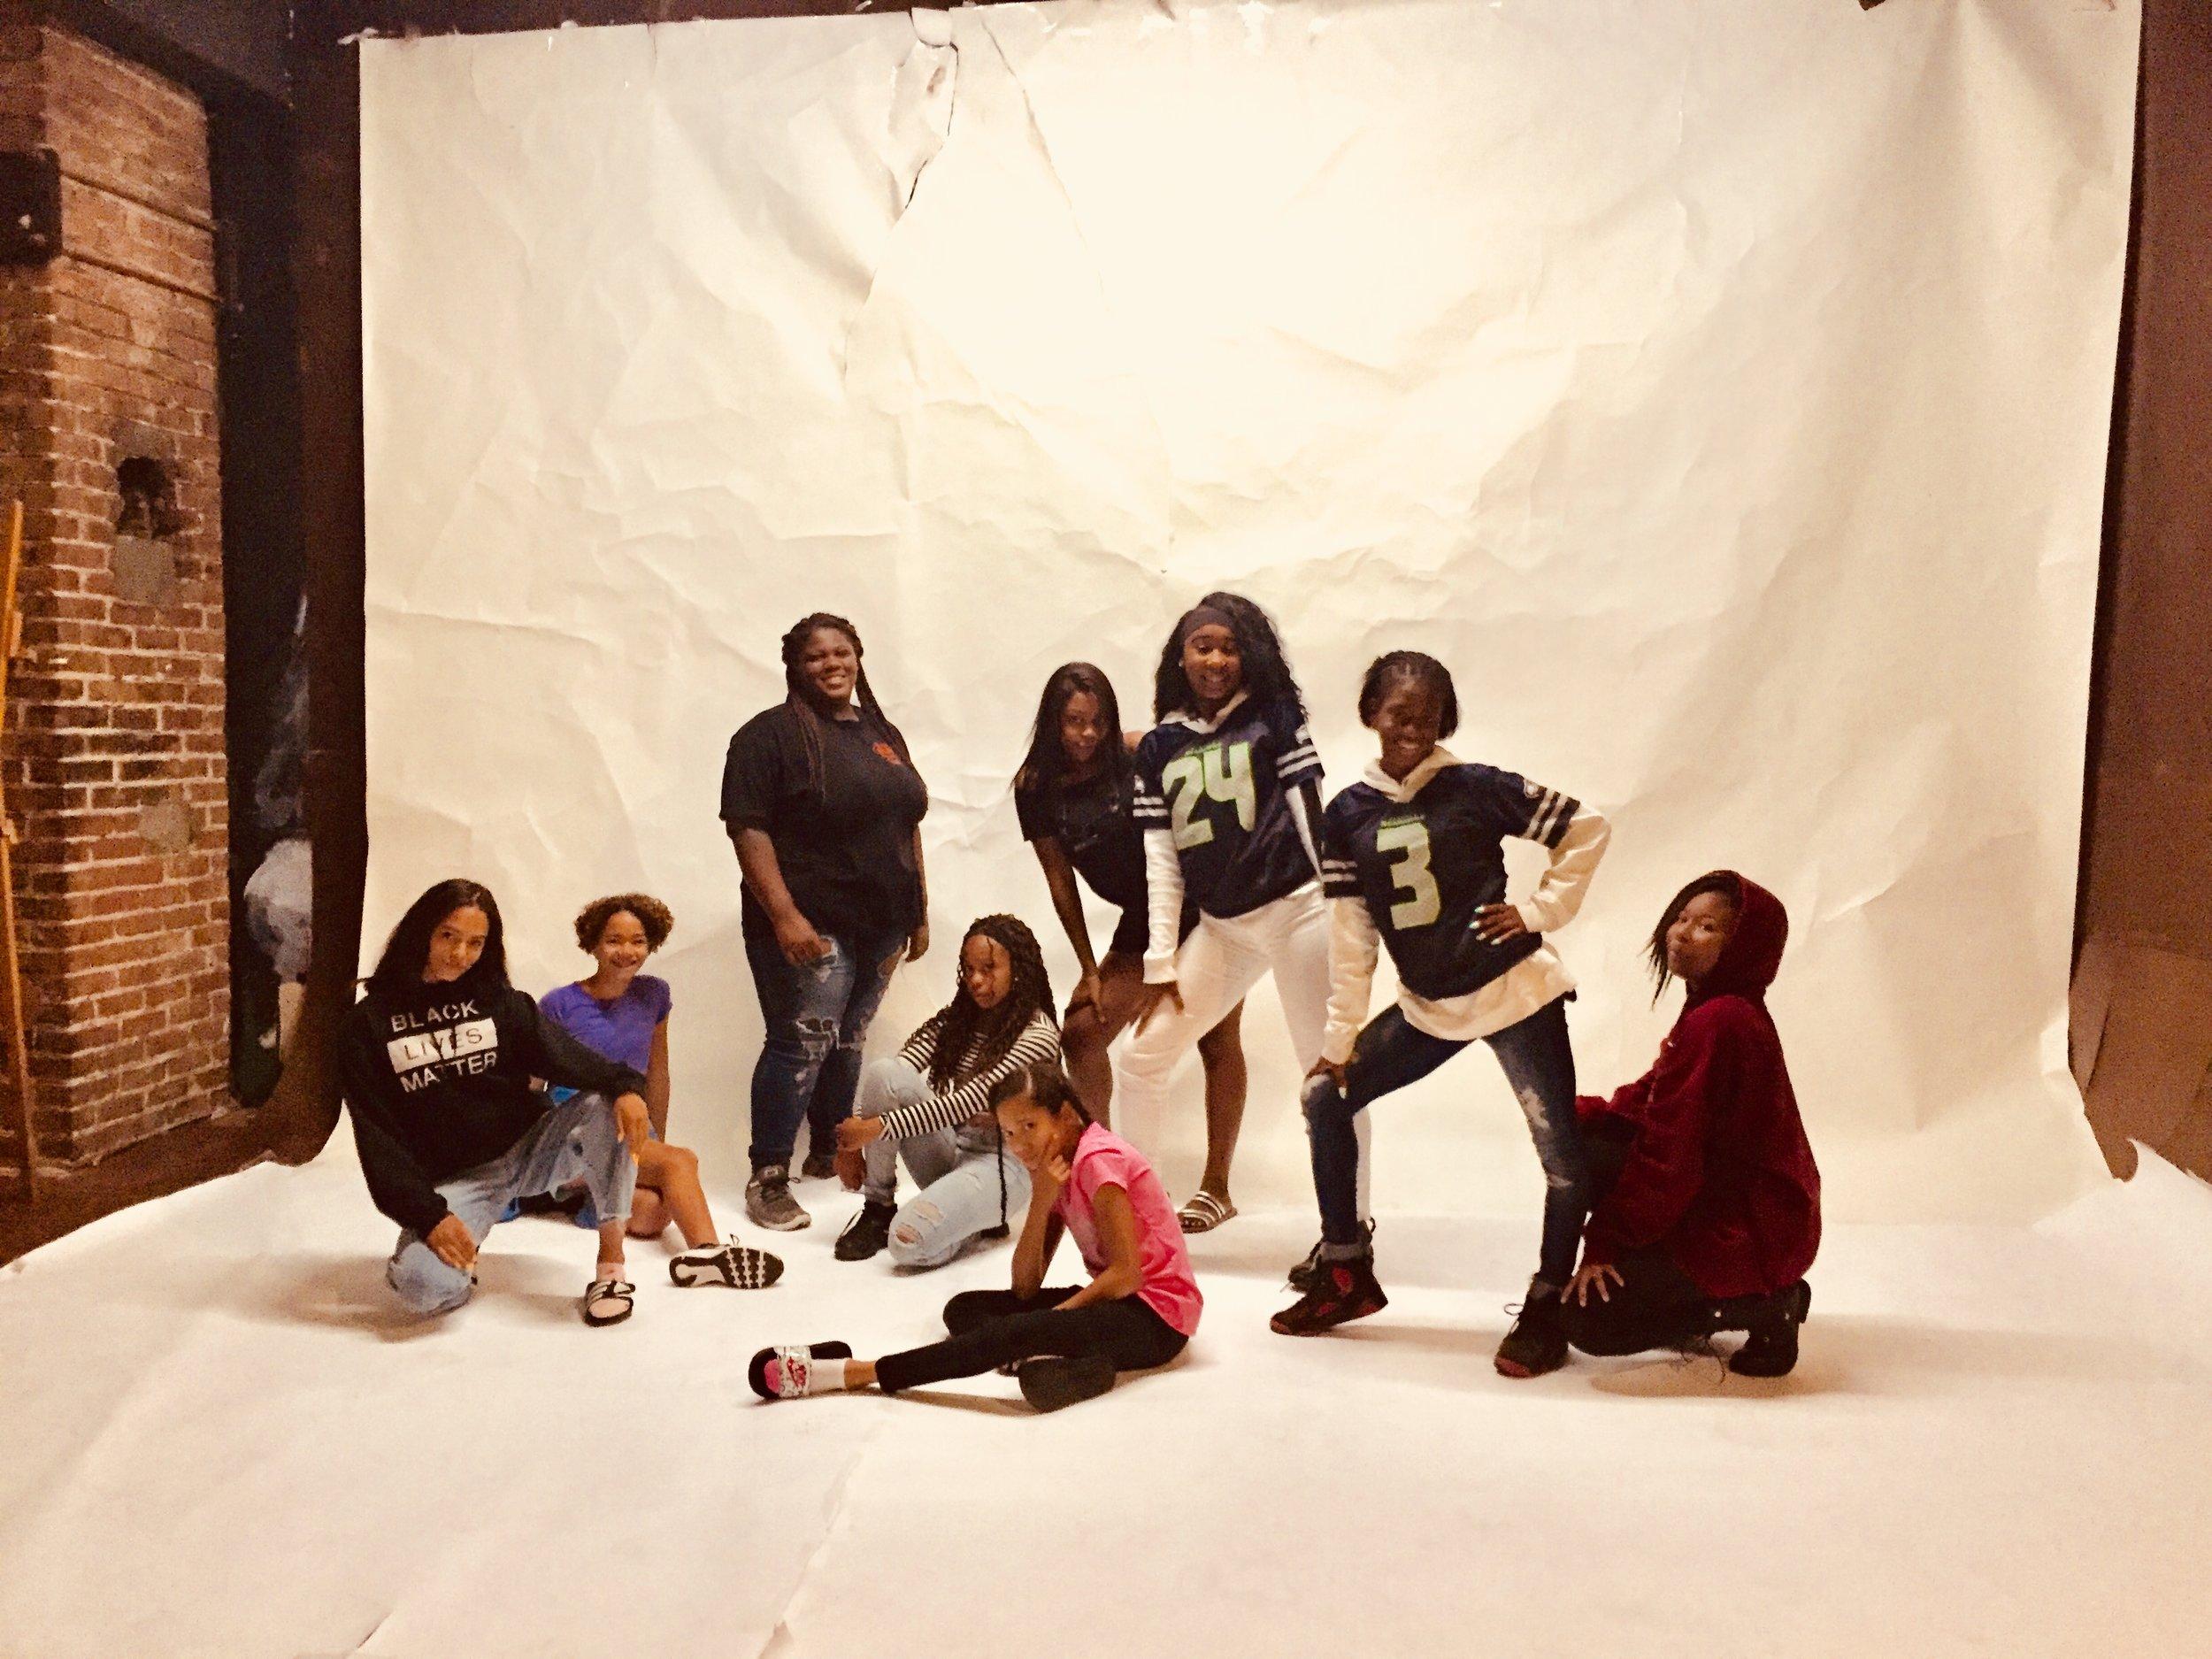 The 2018 #BlvckGrrlsRising cohort posing at the studio